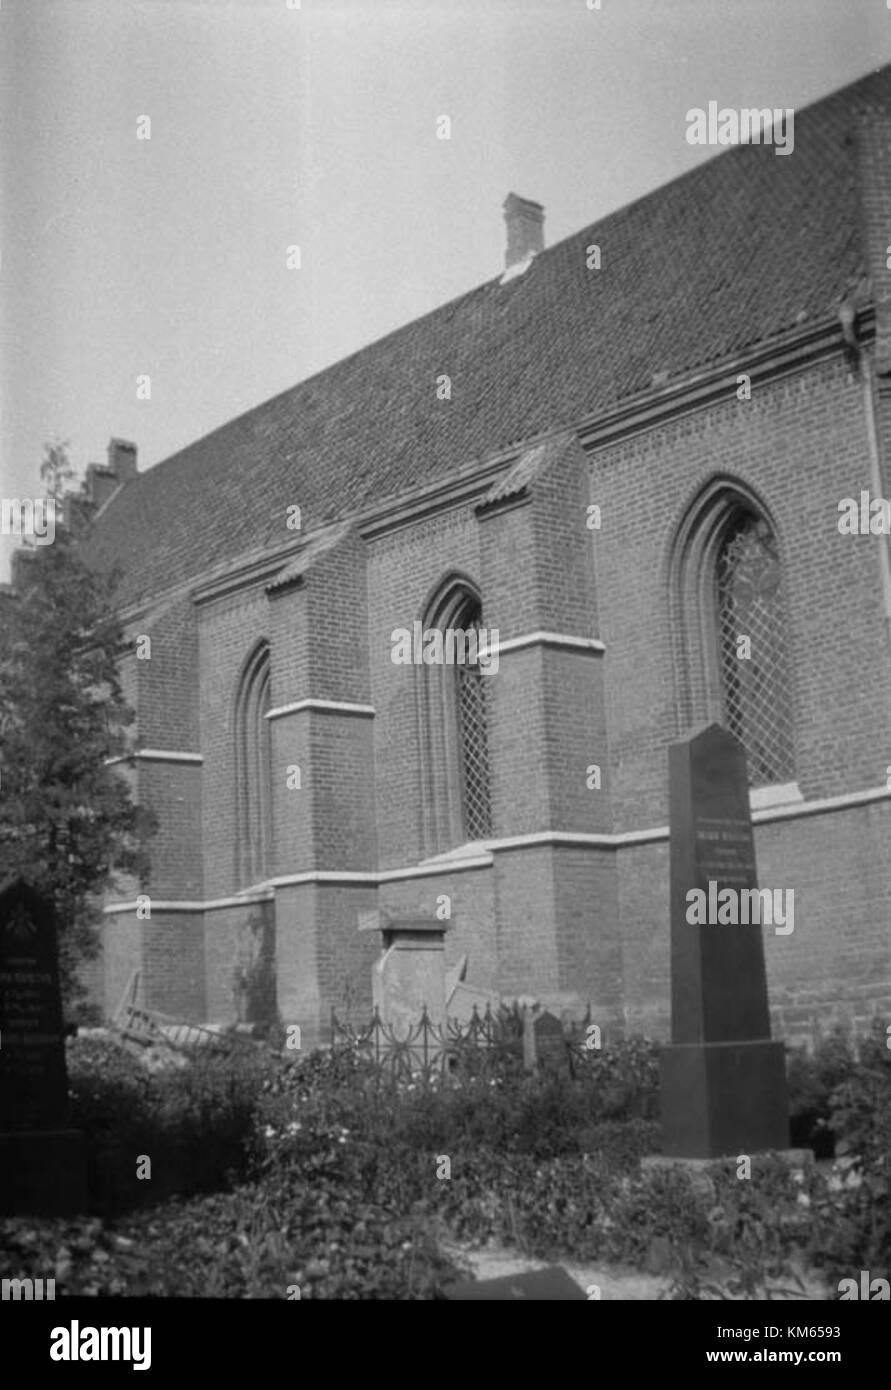 Christensson - Public Member Photos & Scanned - Ancestry